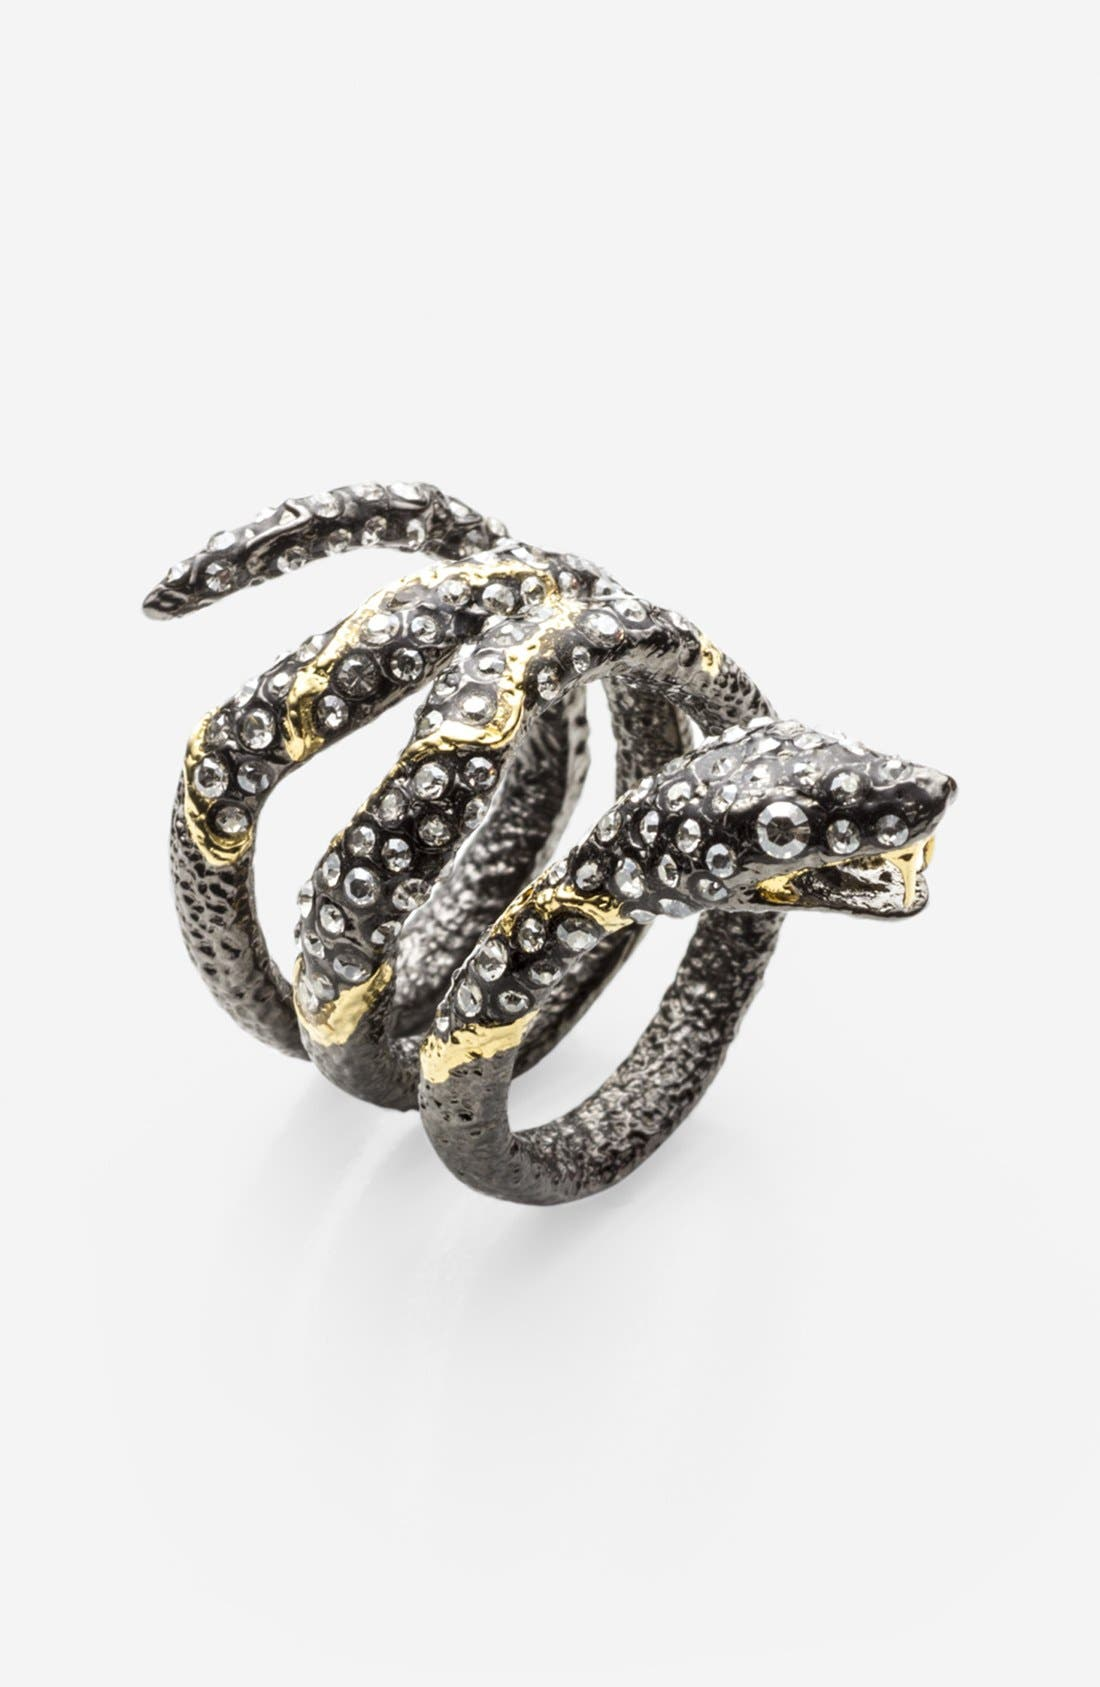 Main Image - Alexis Bittar 'Elements - Jardin de Papillon' Snake Coil Ring